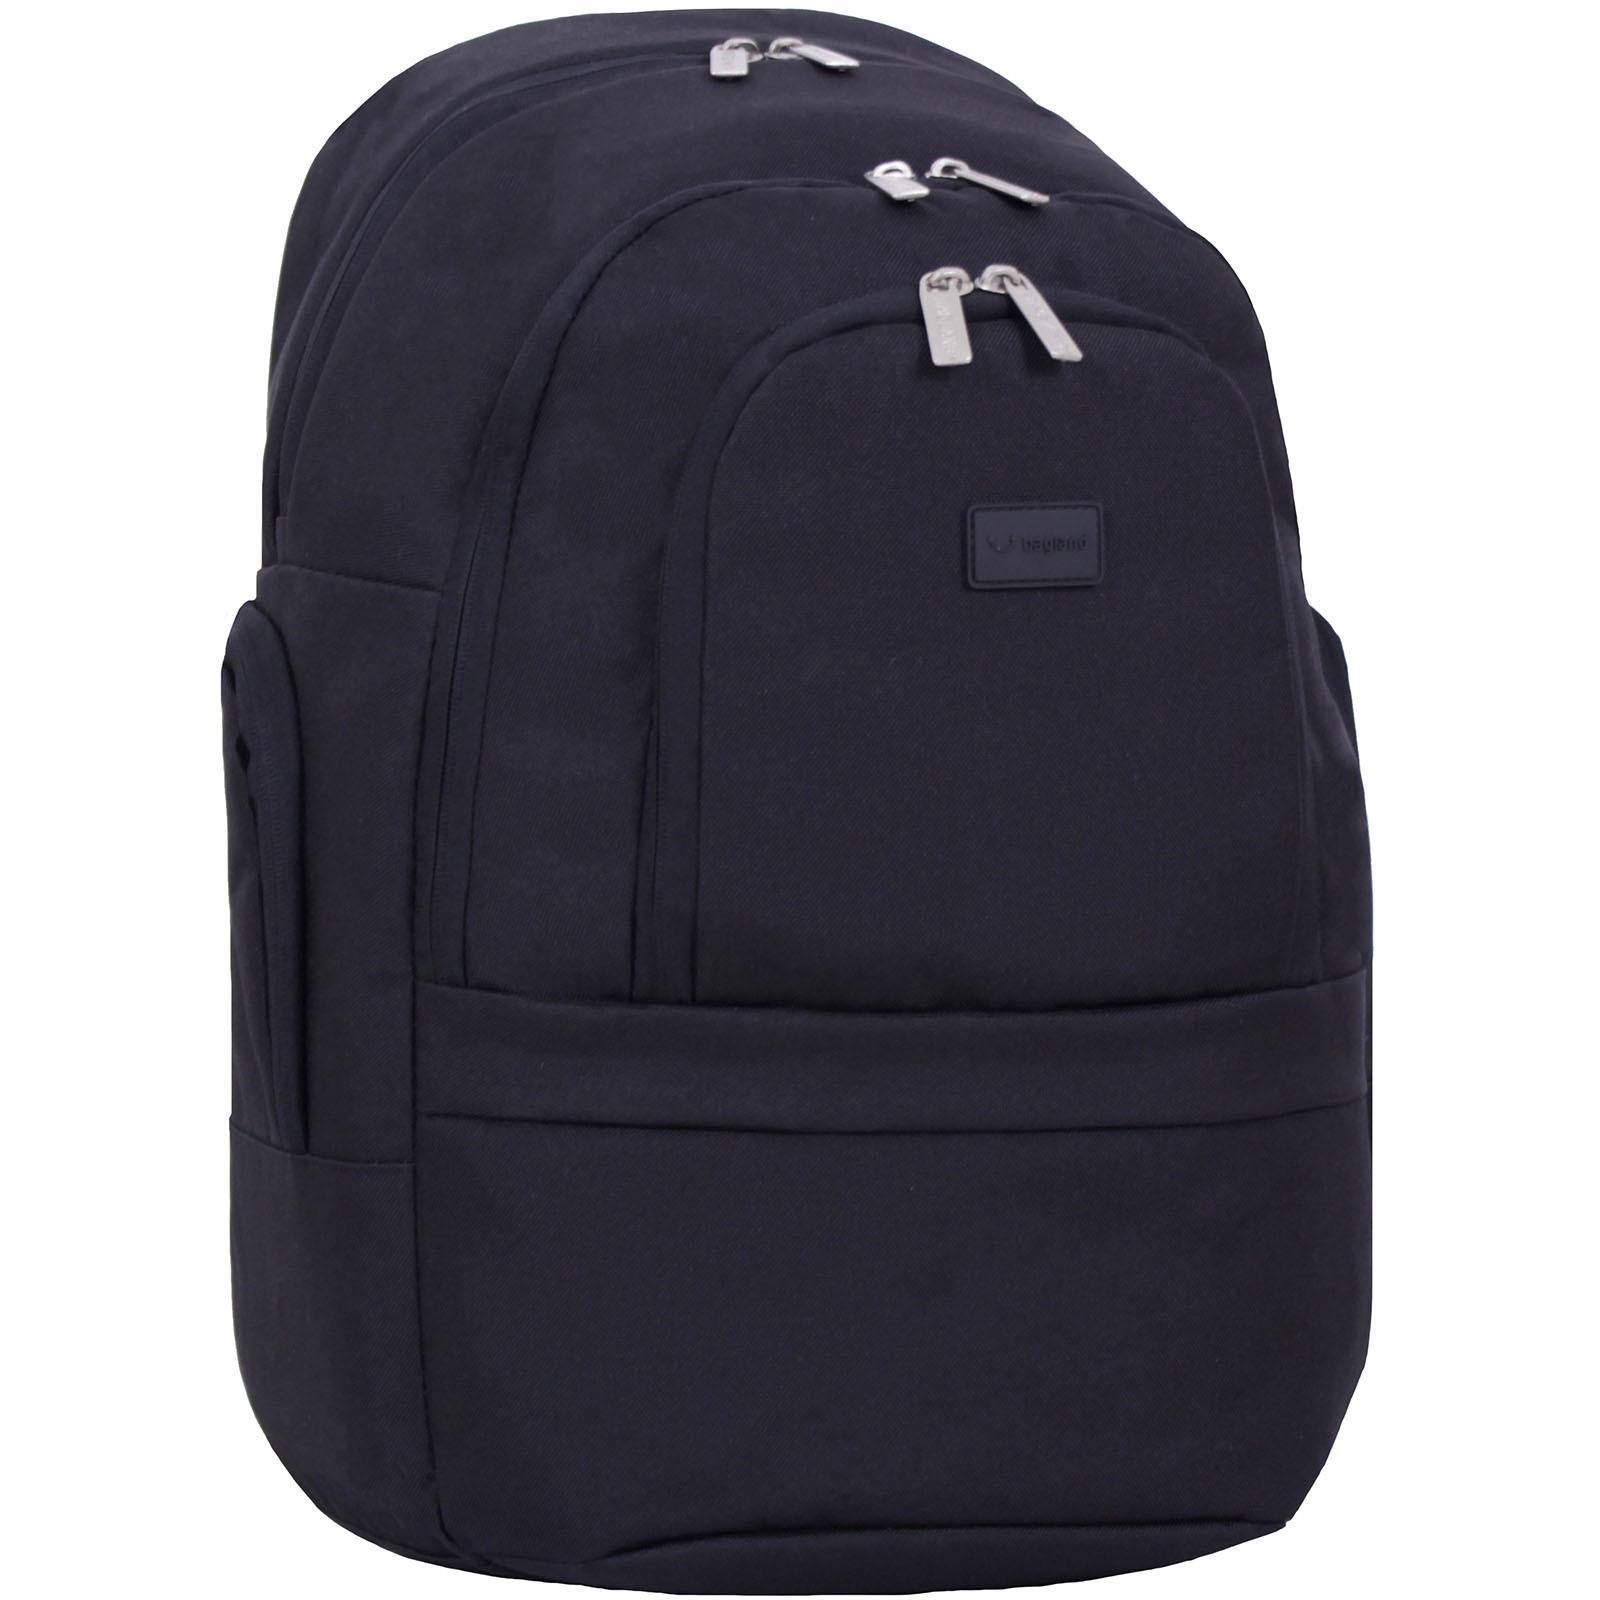 Мужские рюкзаки Рюкзак Bagland Бриг 33 л. черный (0054366) IMG_1836.JPG